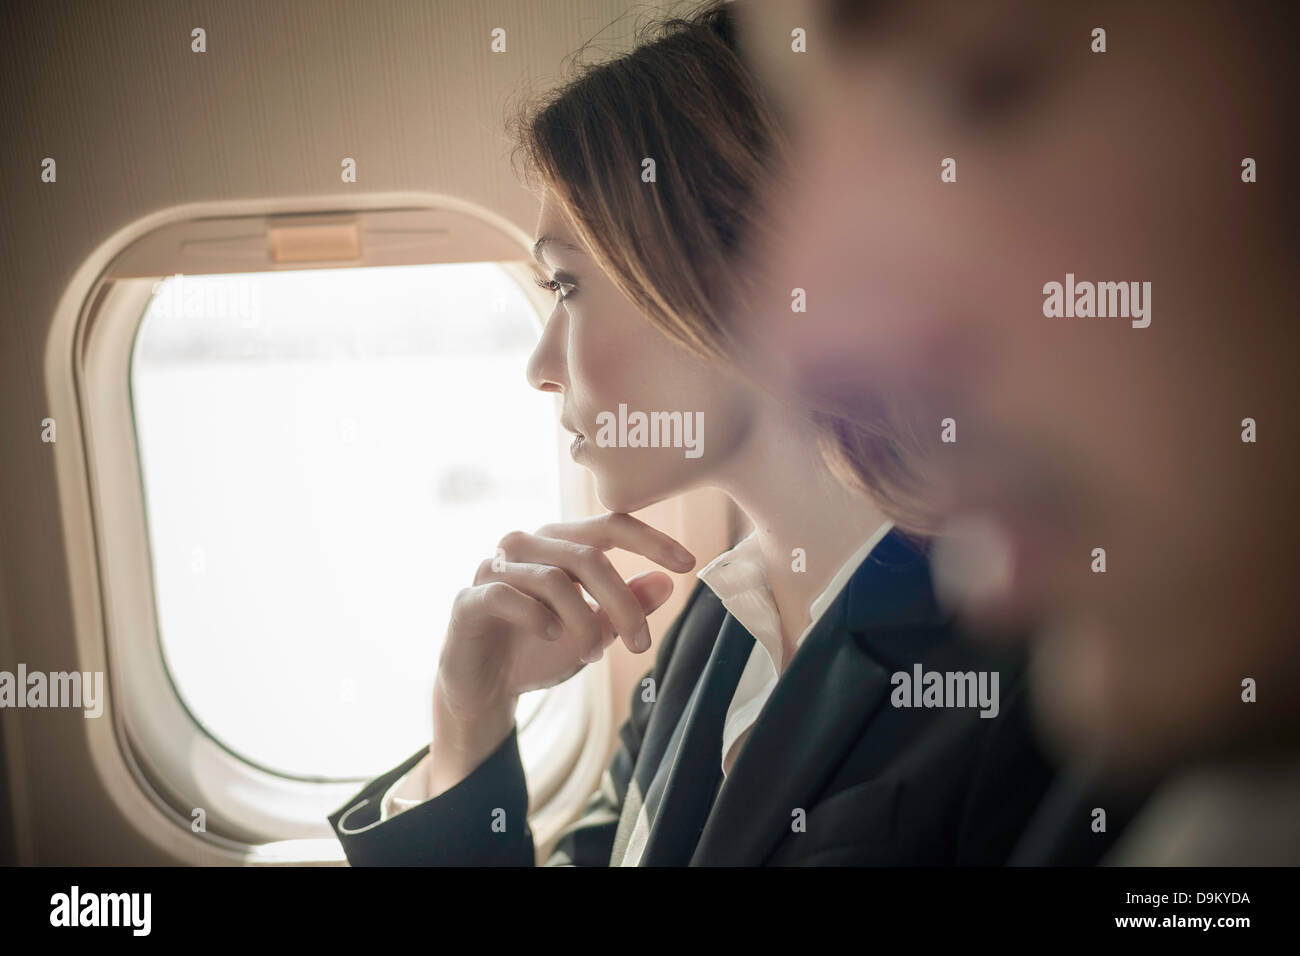 Female passenger looking out of aeroplane window - Stock Image